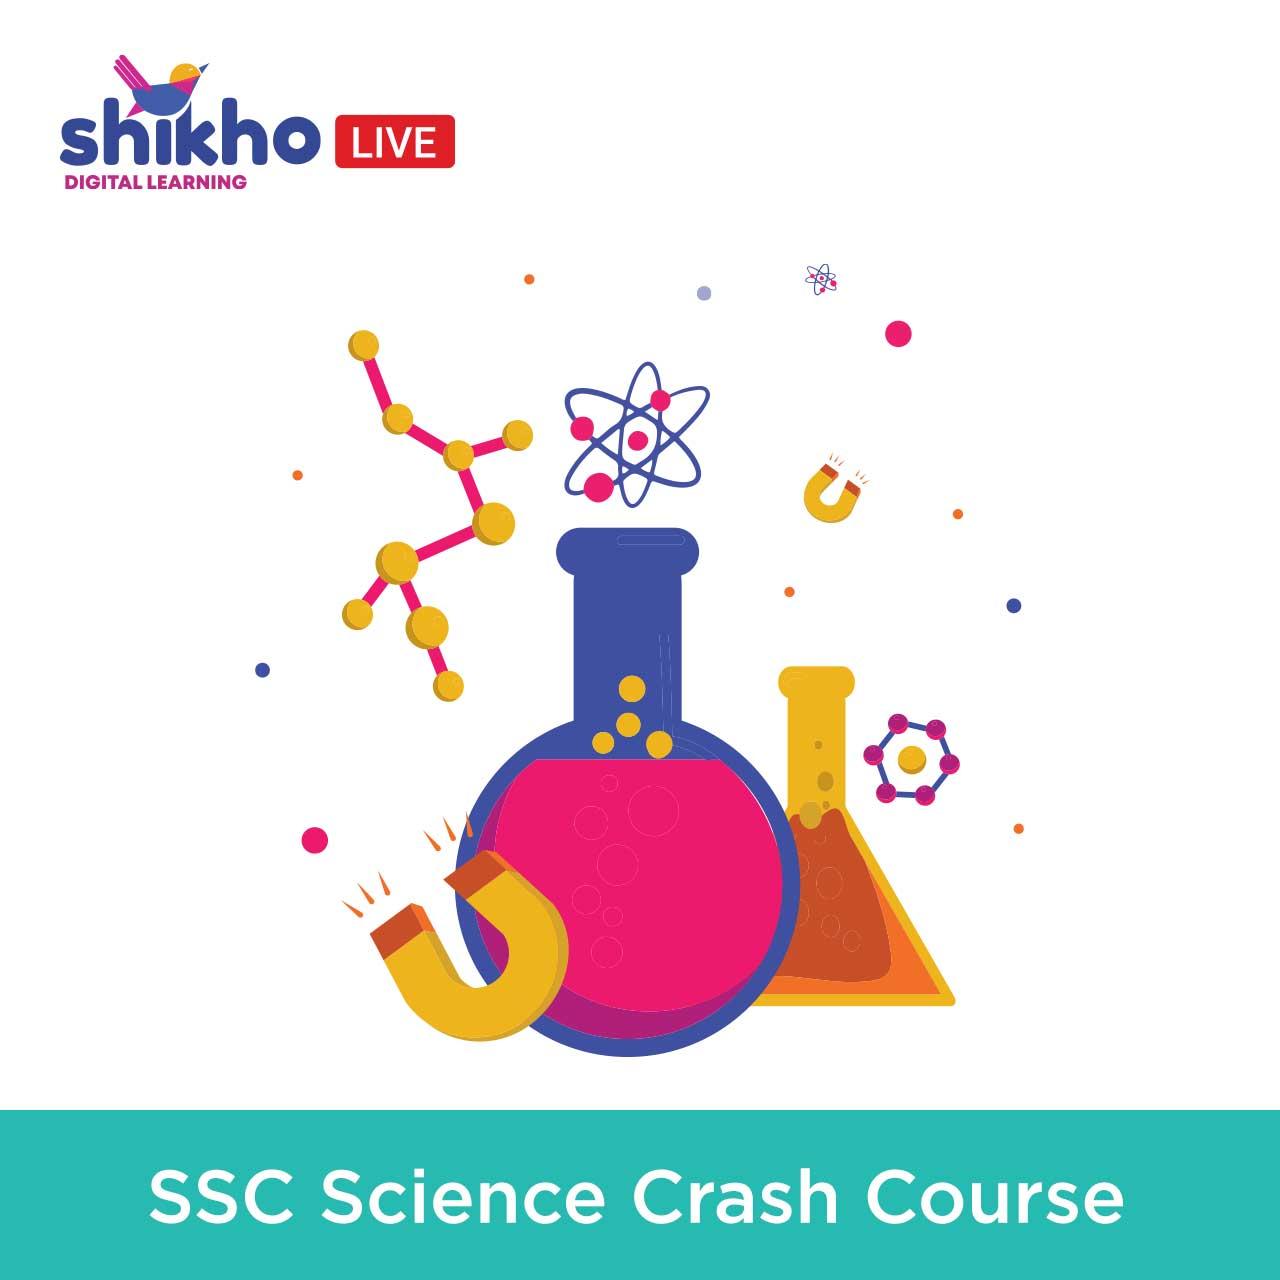 Offer from Shikho